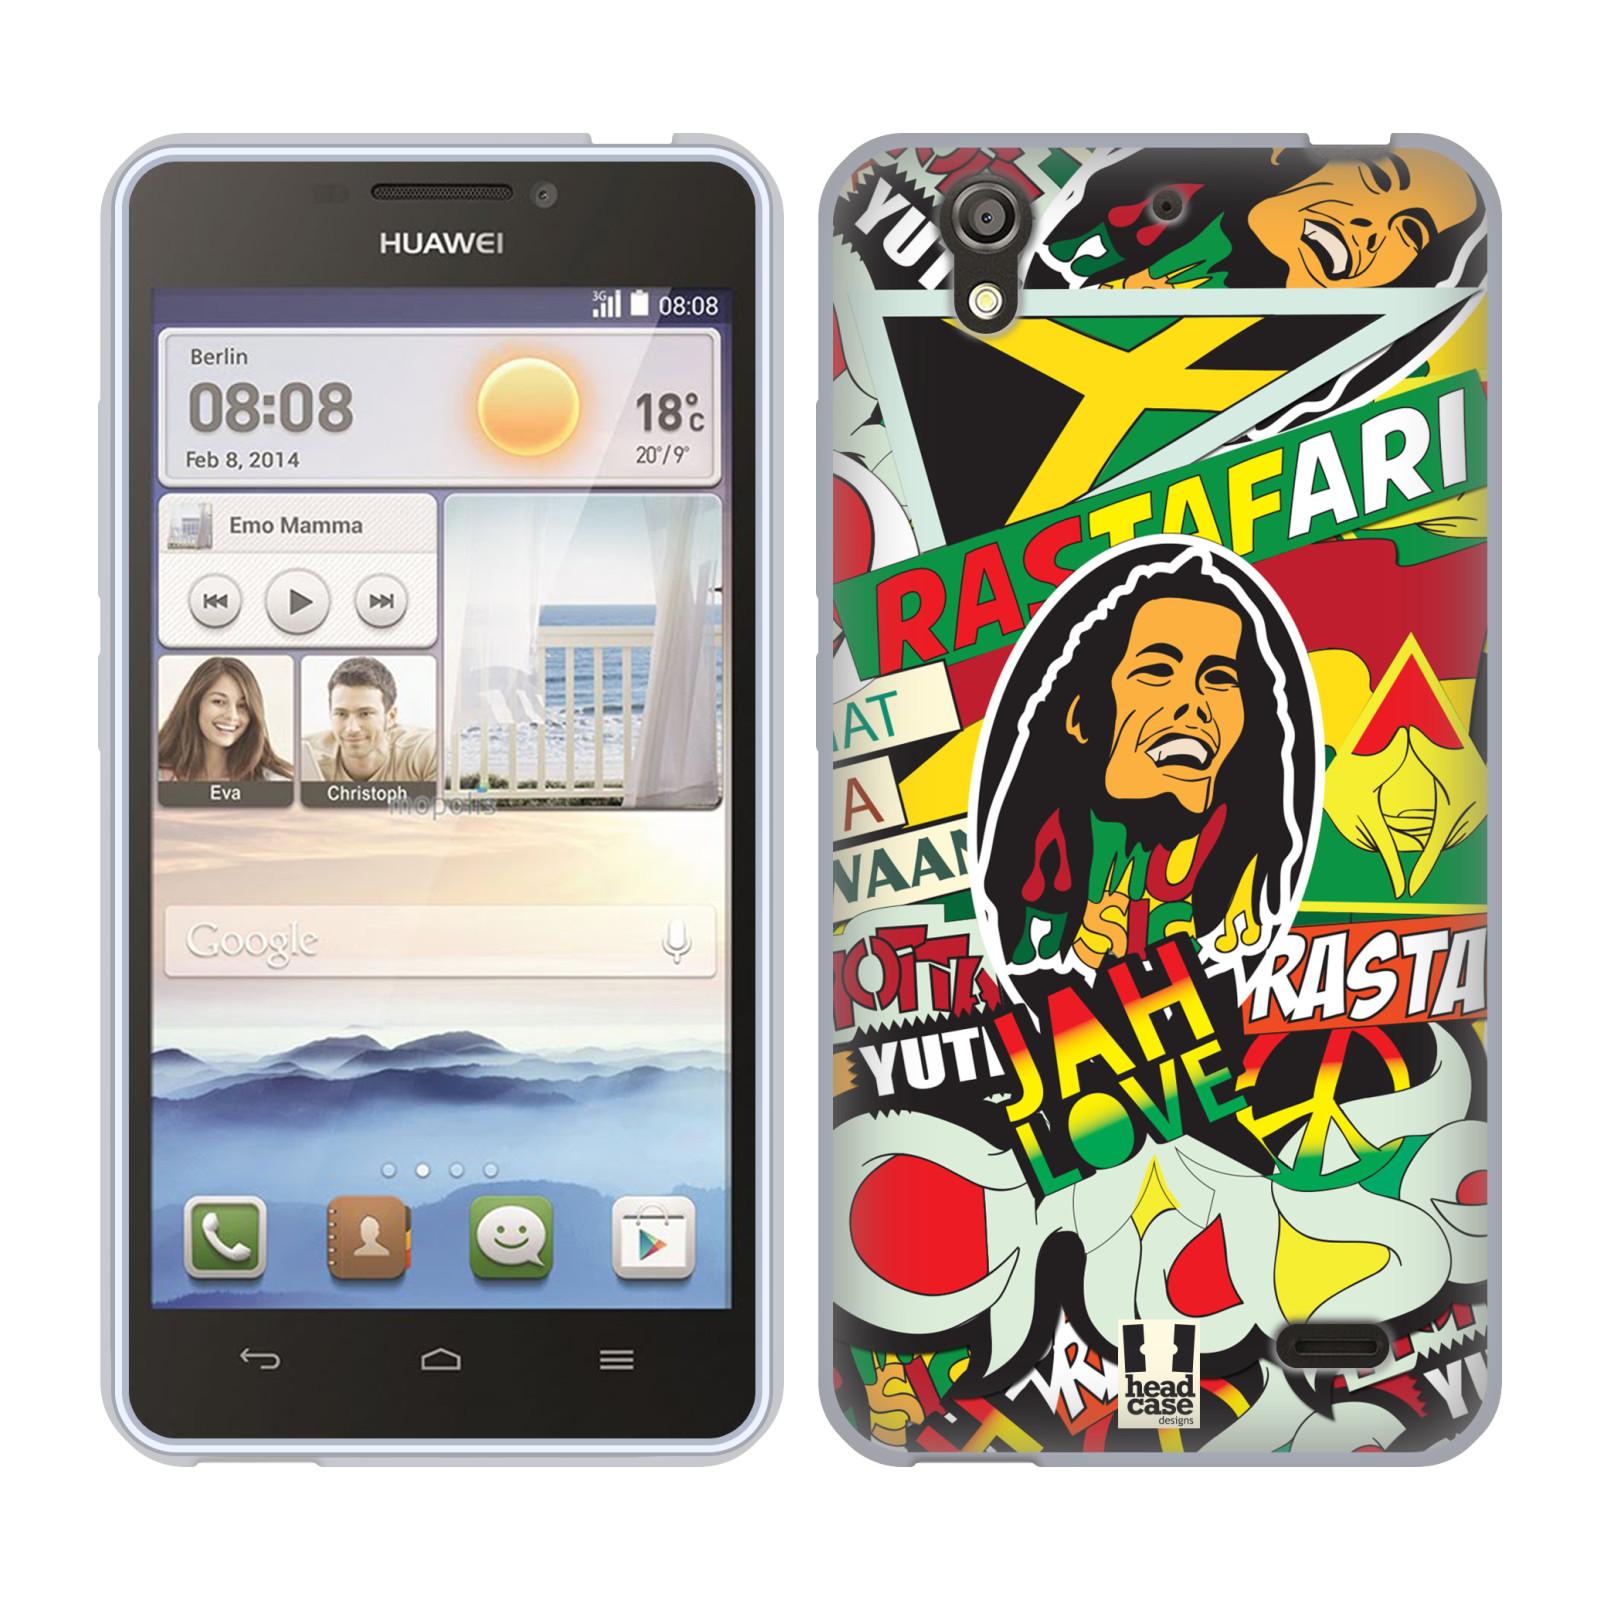 Silikonové pouzdro na mobil Huawei Ascend Y530 HEAD CASE RASTA (Silikonový kryt či obal na mobilní telefon Huawei Ascend Y530)